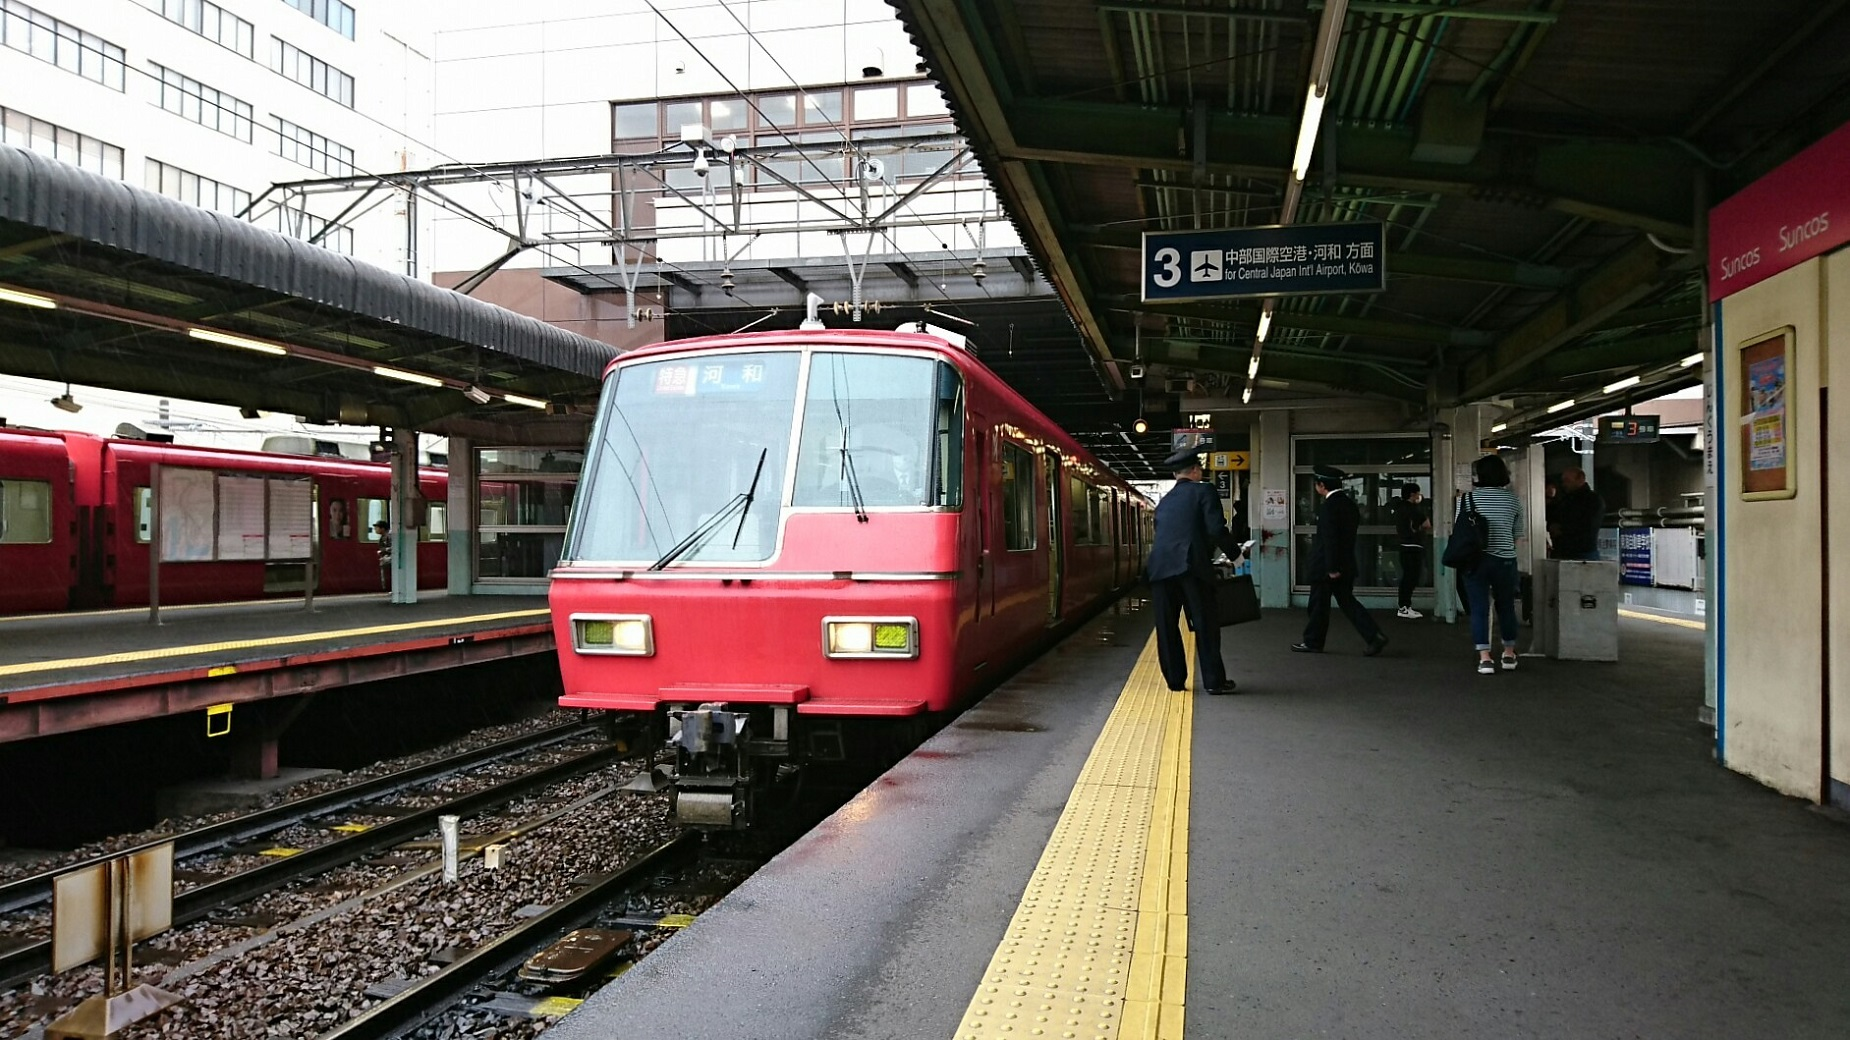 2018.4.24 名古屋 (26) 神宮前 - 河和いき特急 1850-1040